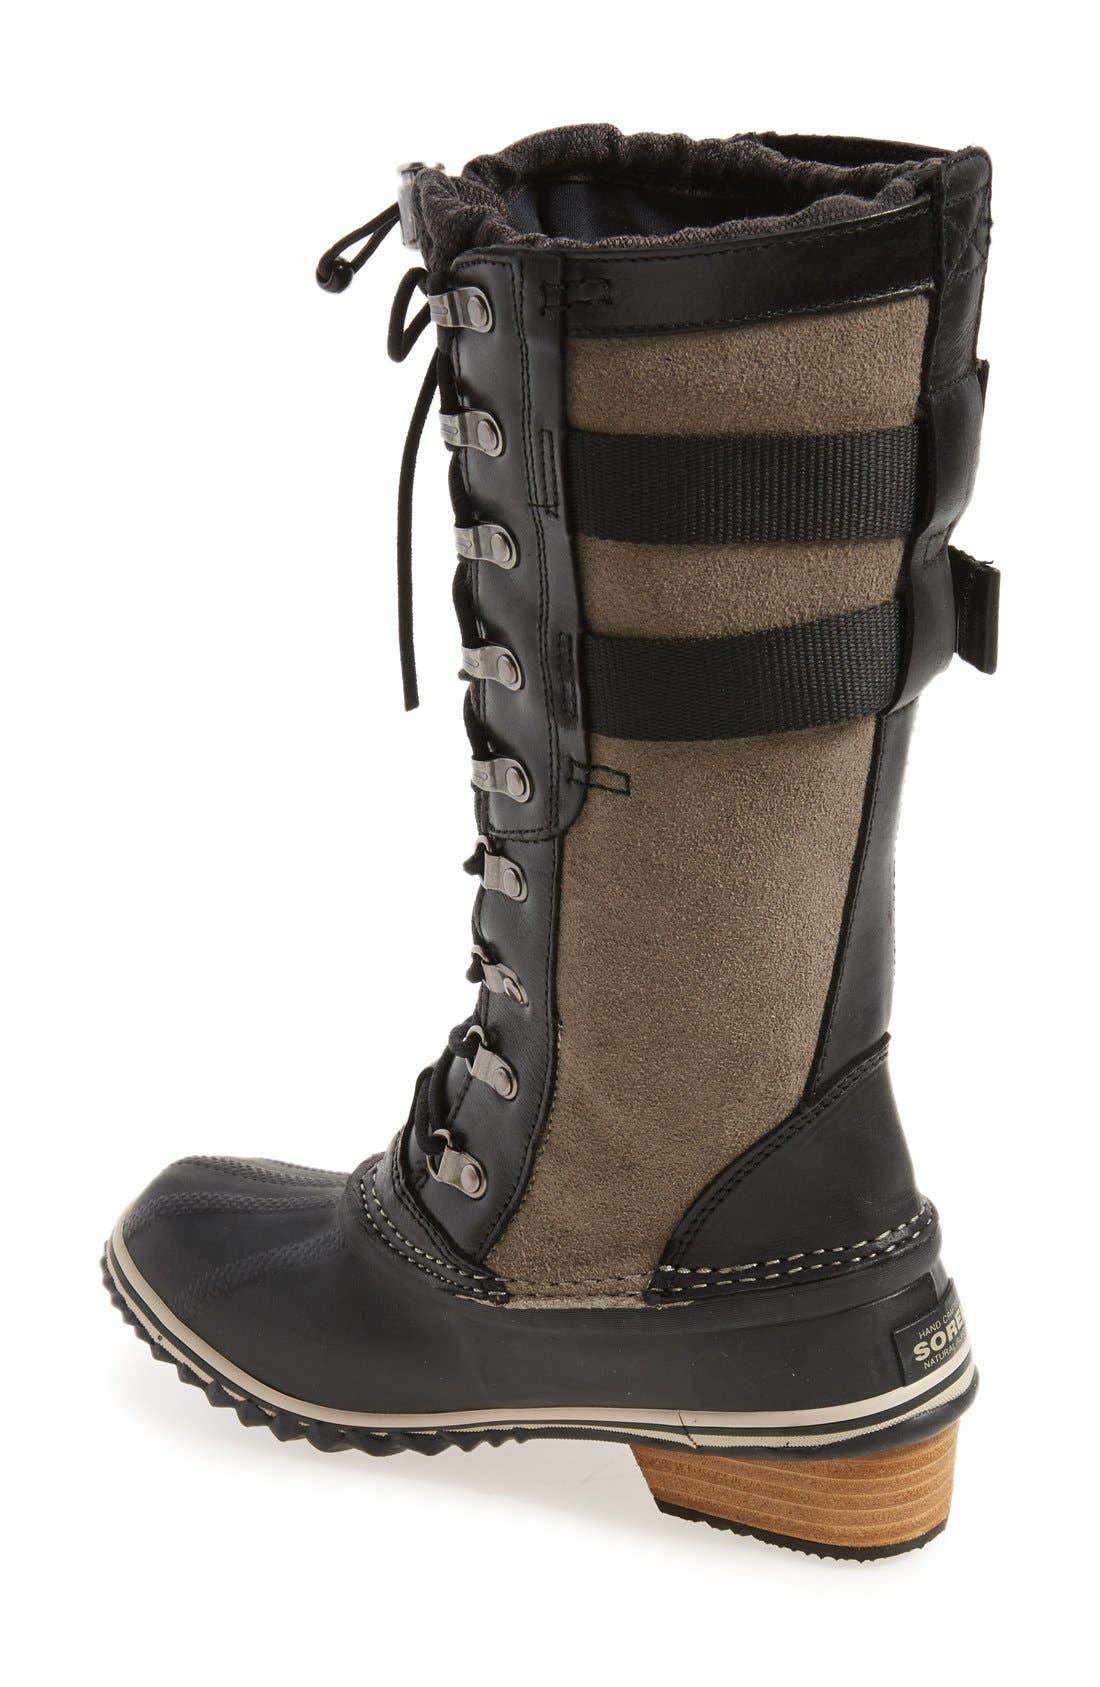 Alternate Image 2  - SOREL 'Conquest Carly II' Waterproof Mid Calf Boot (Women)